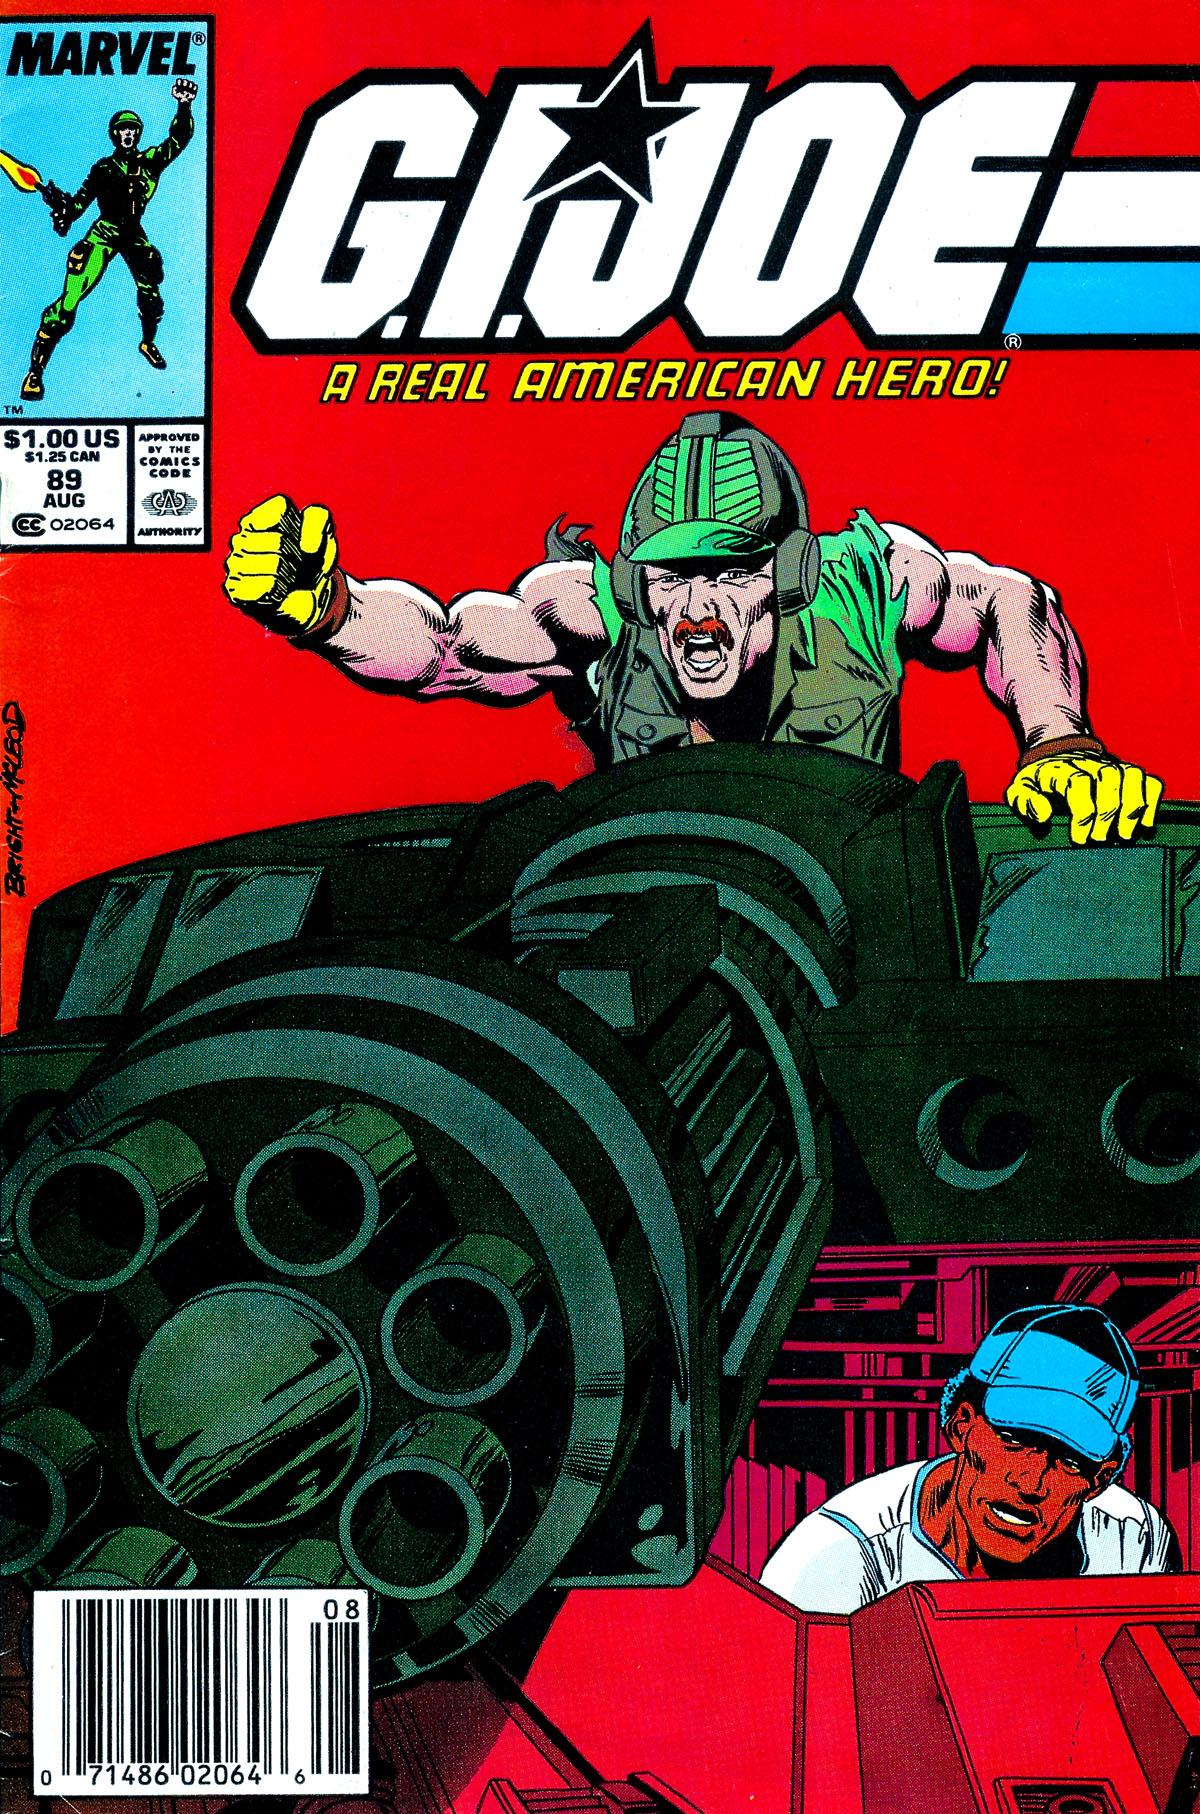 G.I. Joe: A Real American Hero 89 Page 1